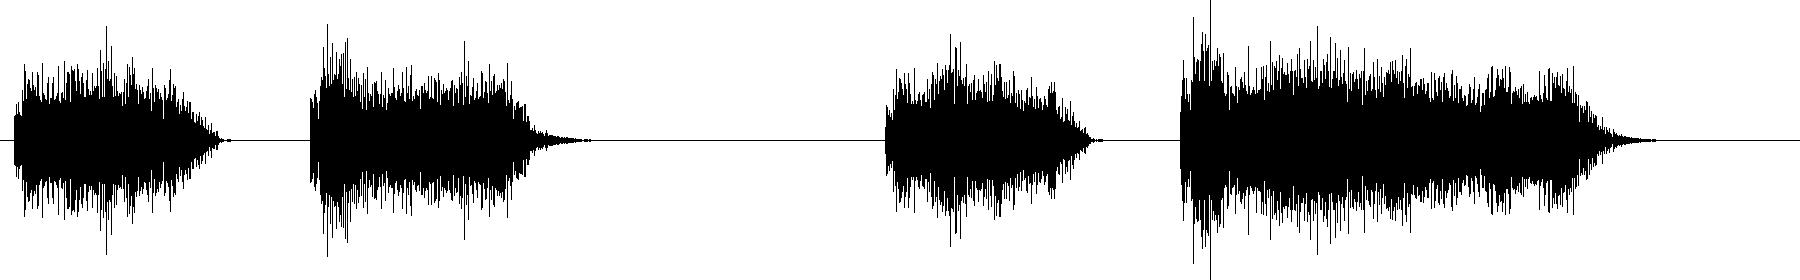 vocal fx   naming hard house genre 130 bpm